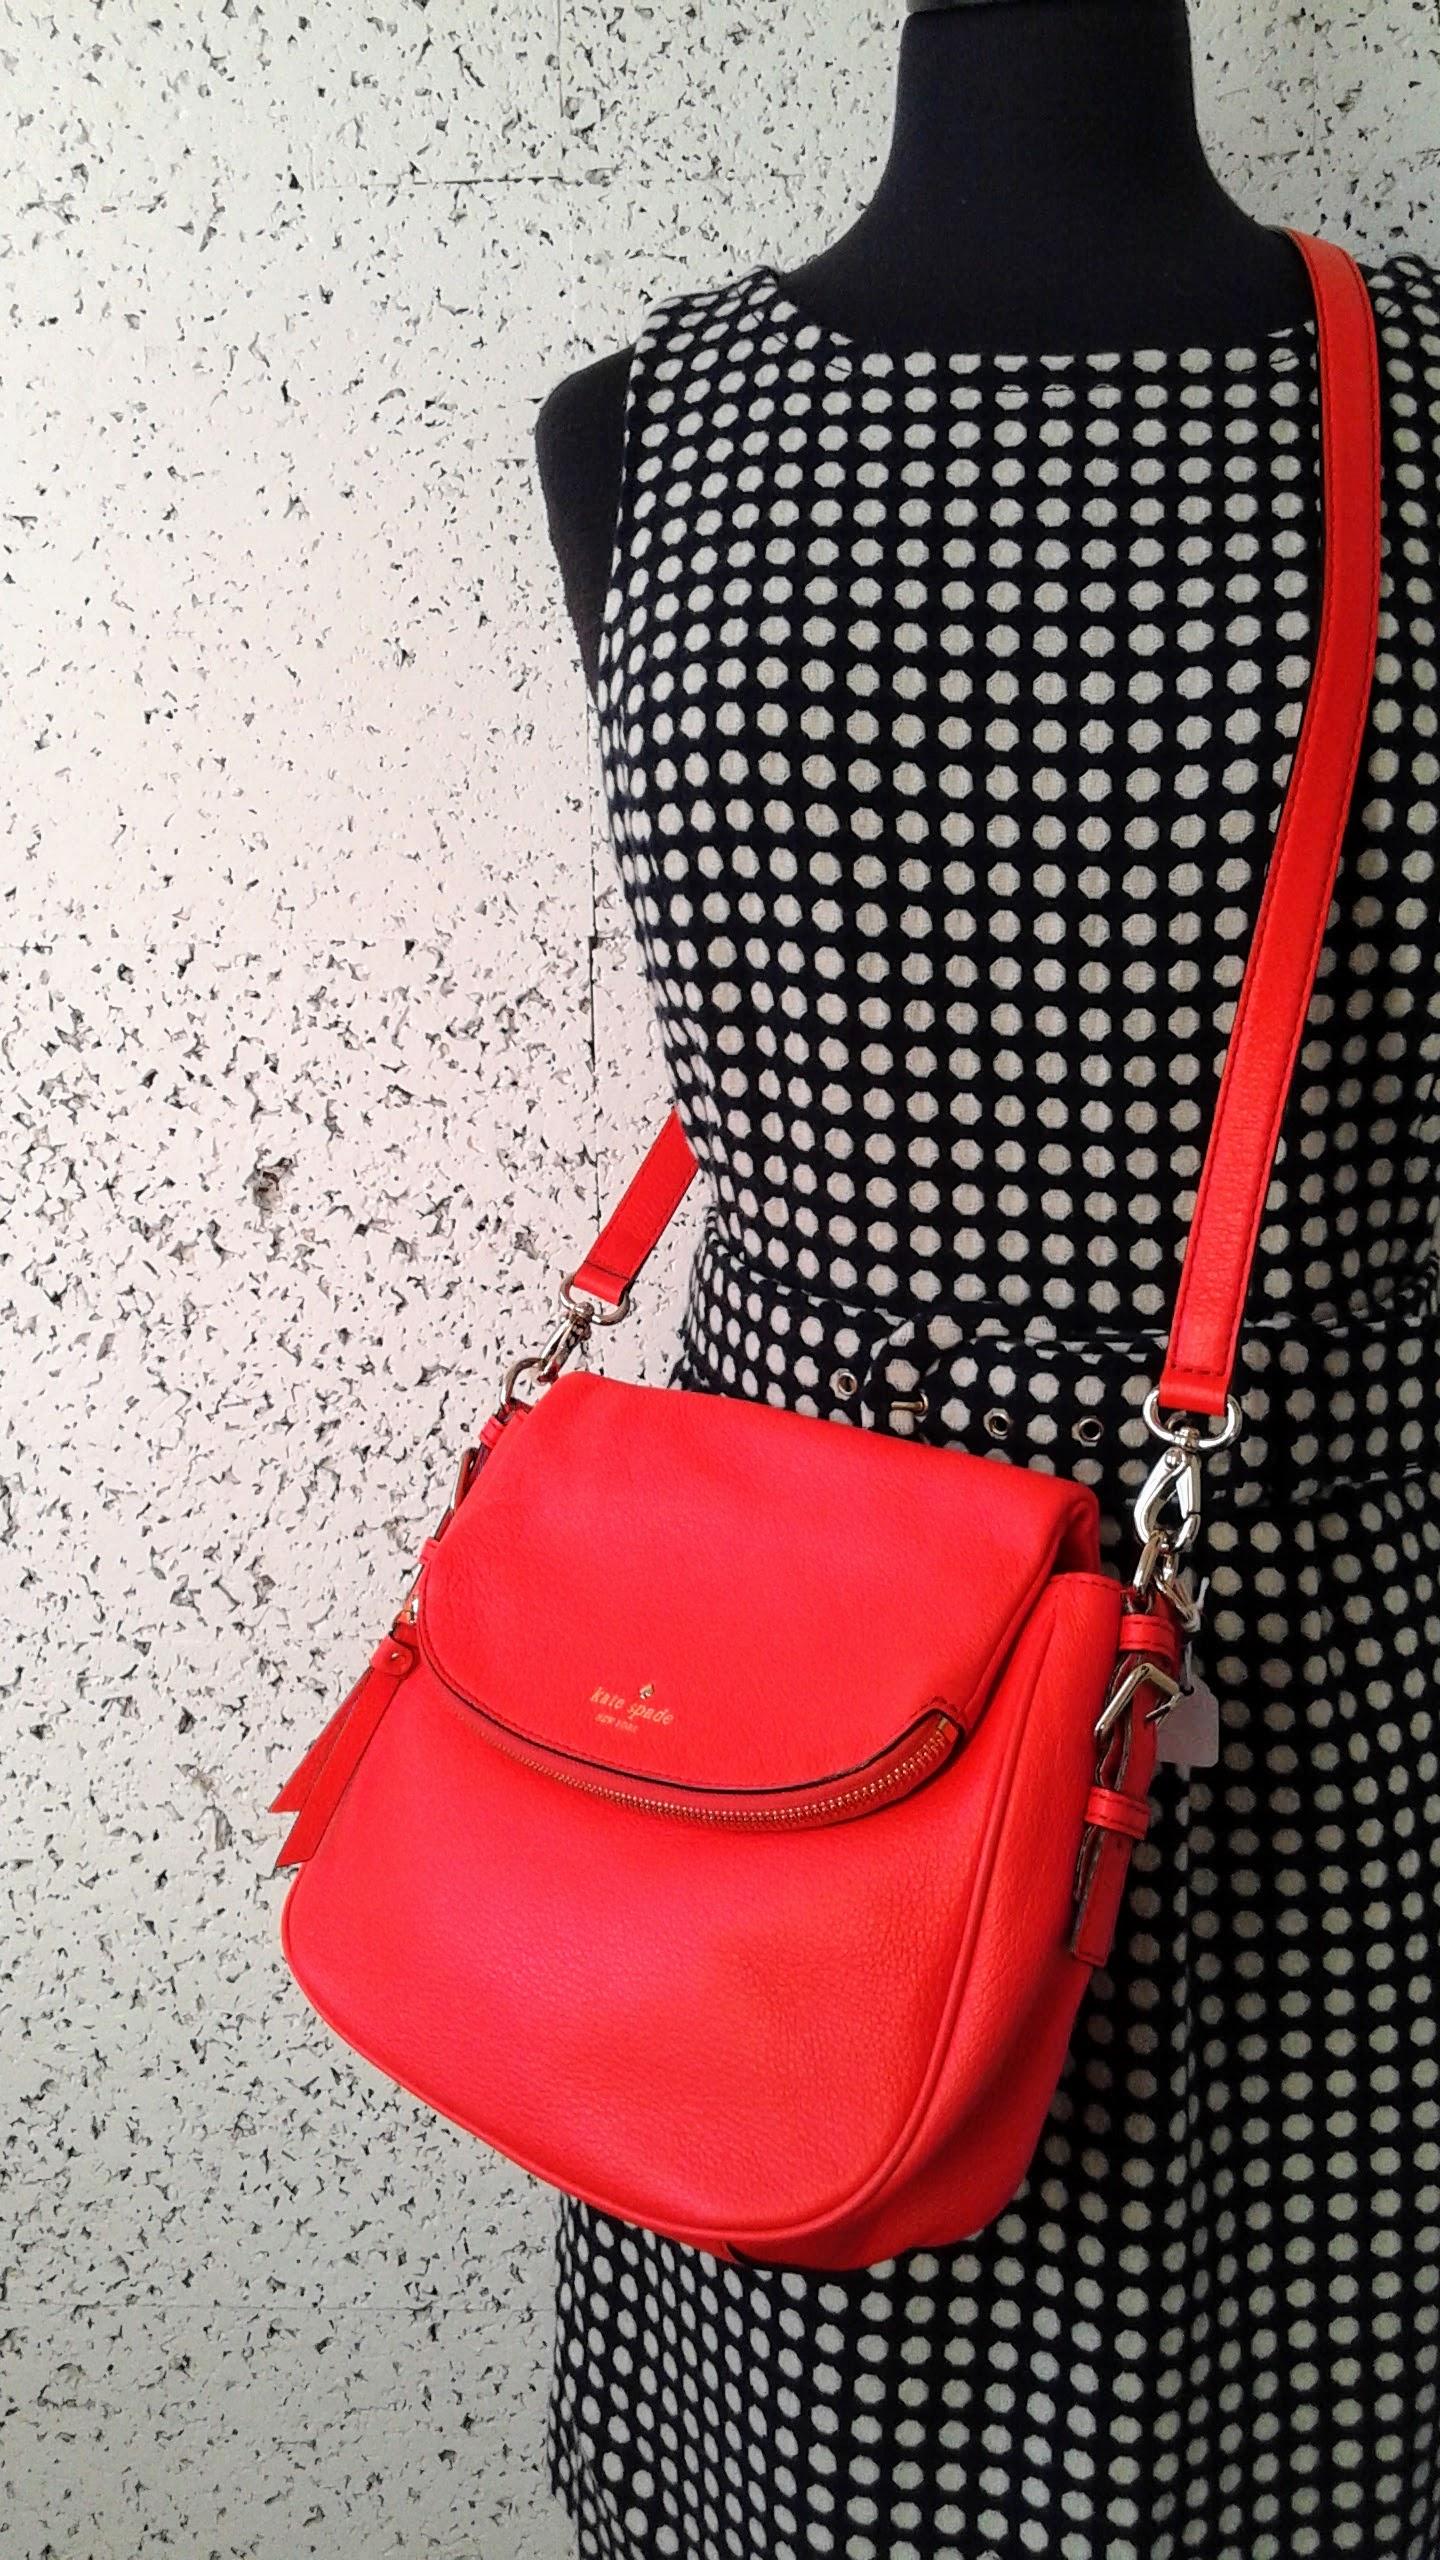 Kate Spade purse.Juicy Couture dress; Size 10, $48